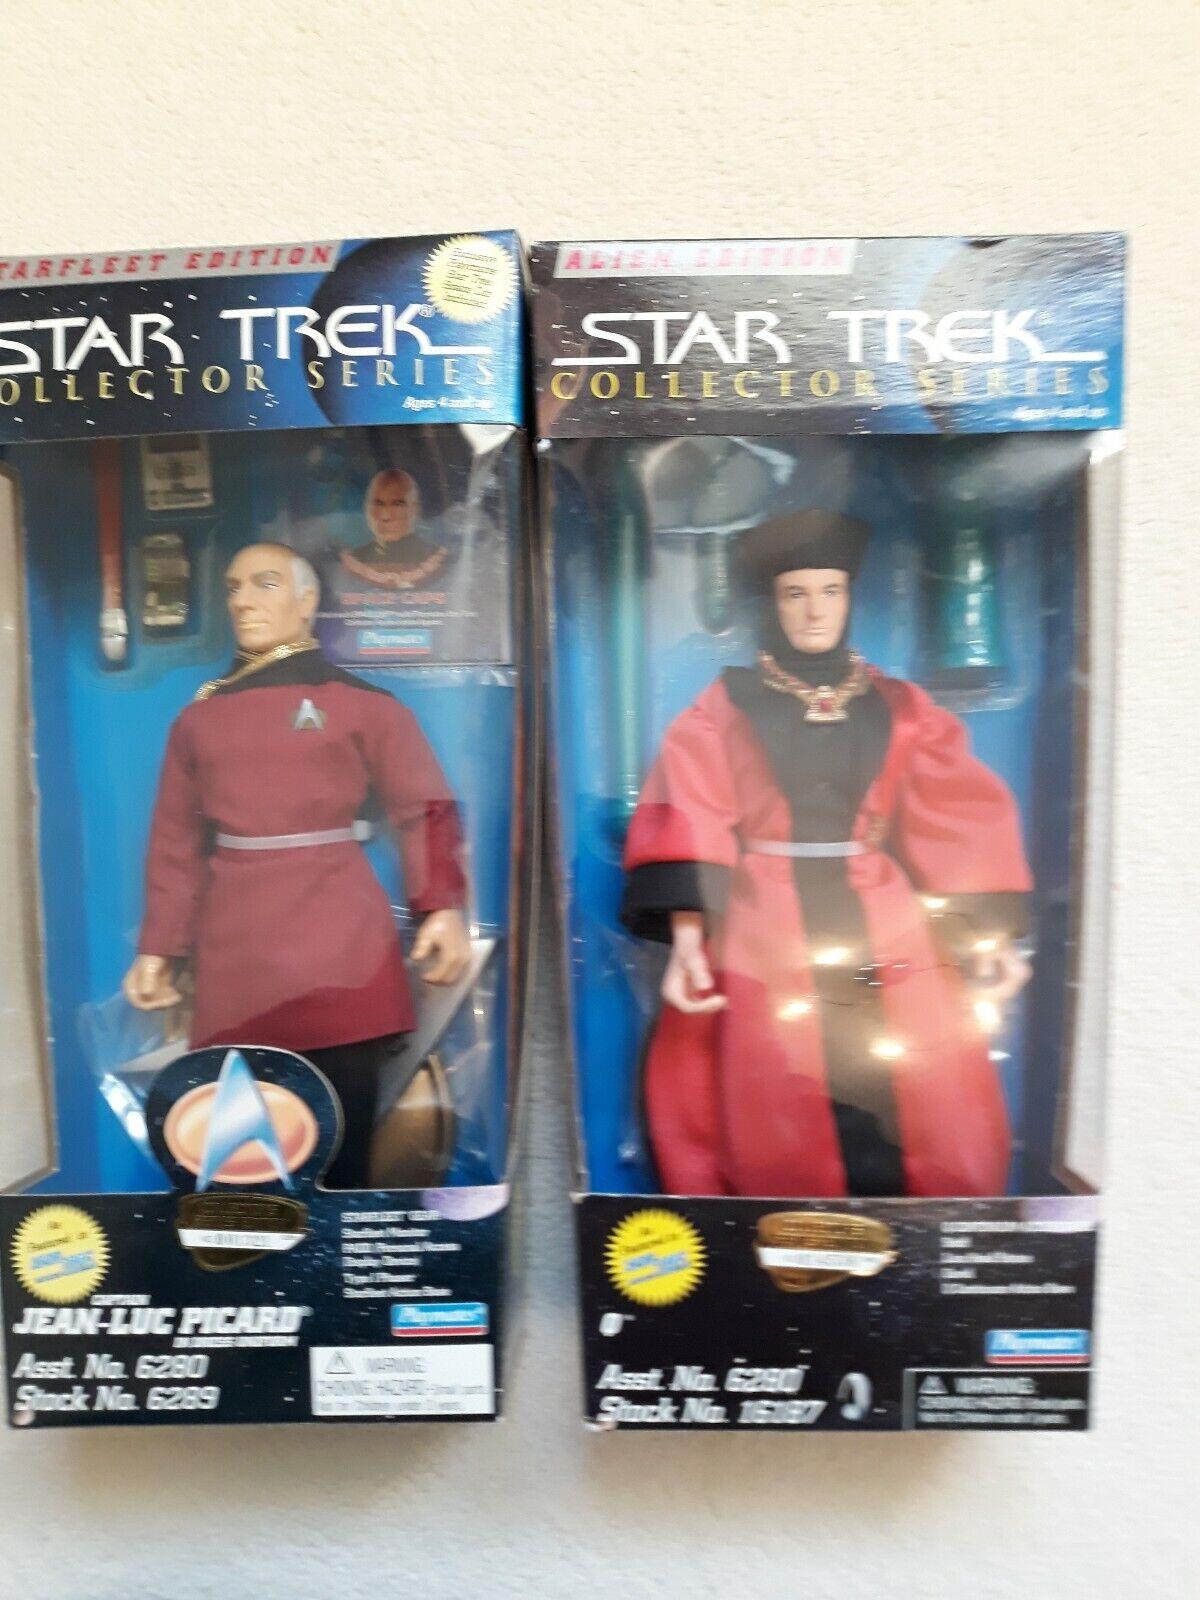 2 Playmates Star Trek 9  Action Figures Figures Figures dolls of Q. Alien picard dress uniform 44787b